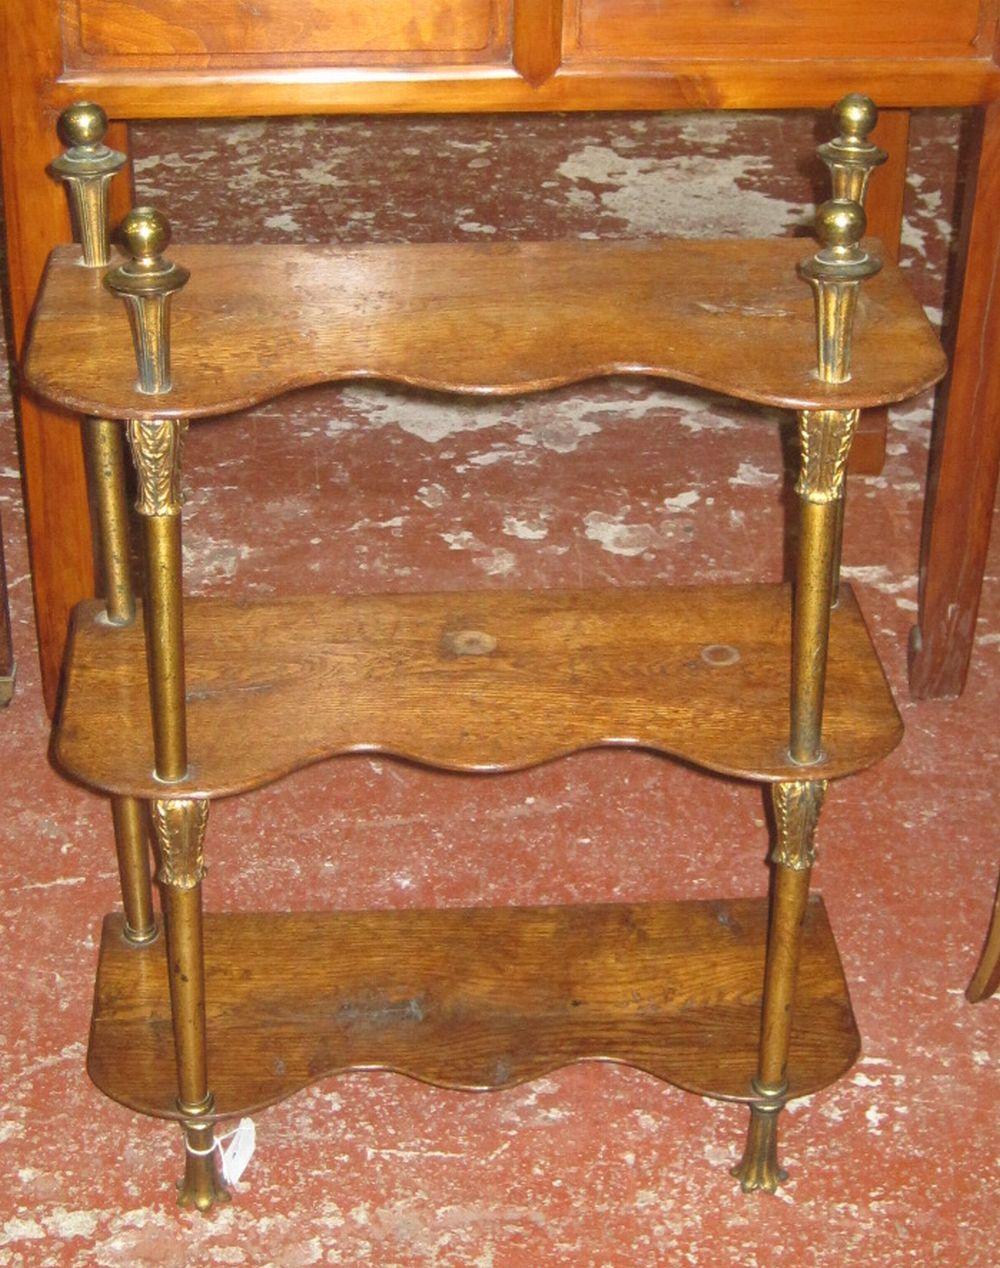 A set of three gilt metal and oak hanging shelves